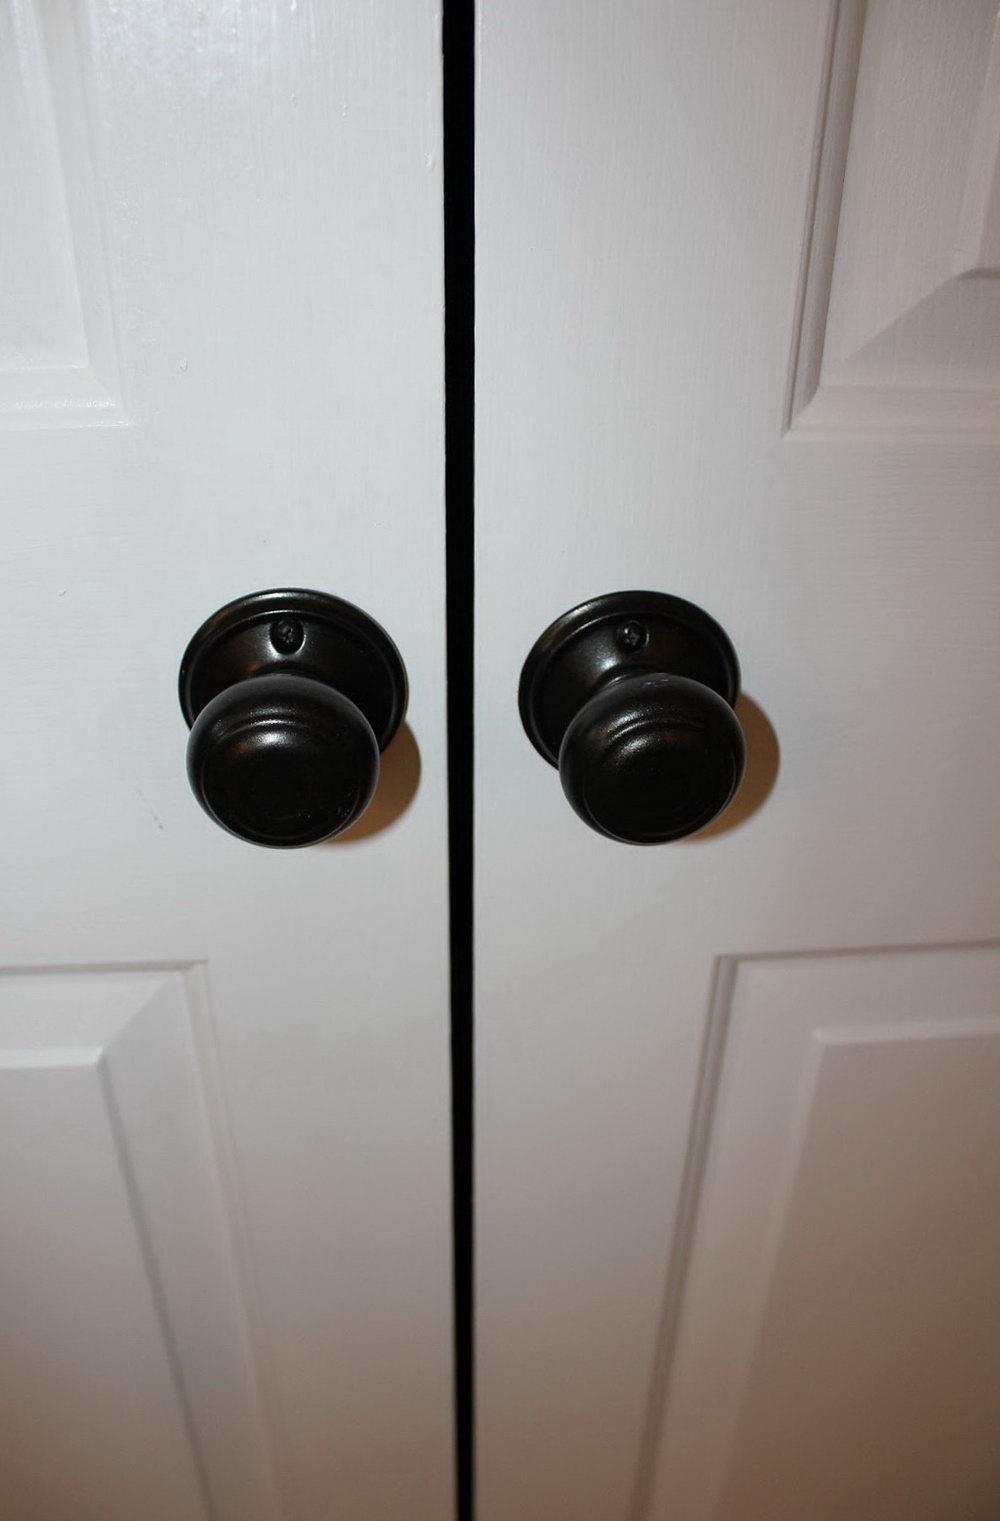 closet door knobs decorative photo - 9